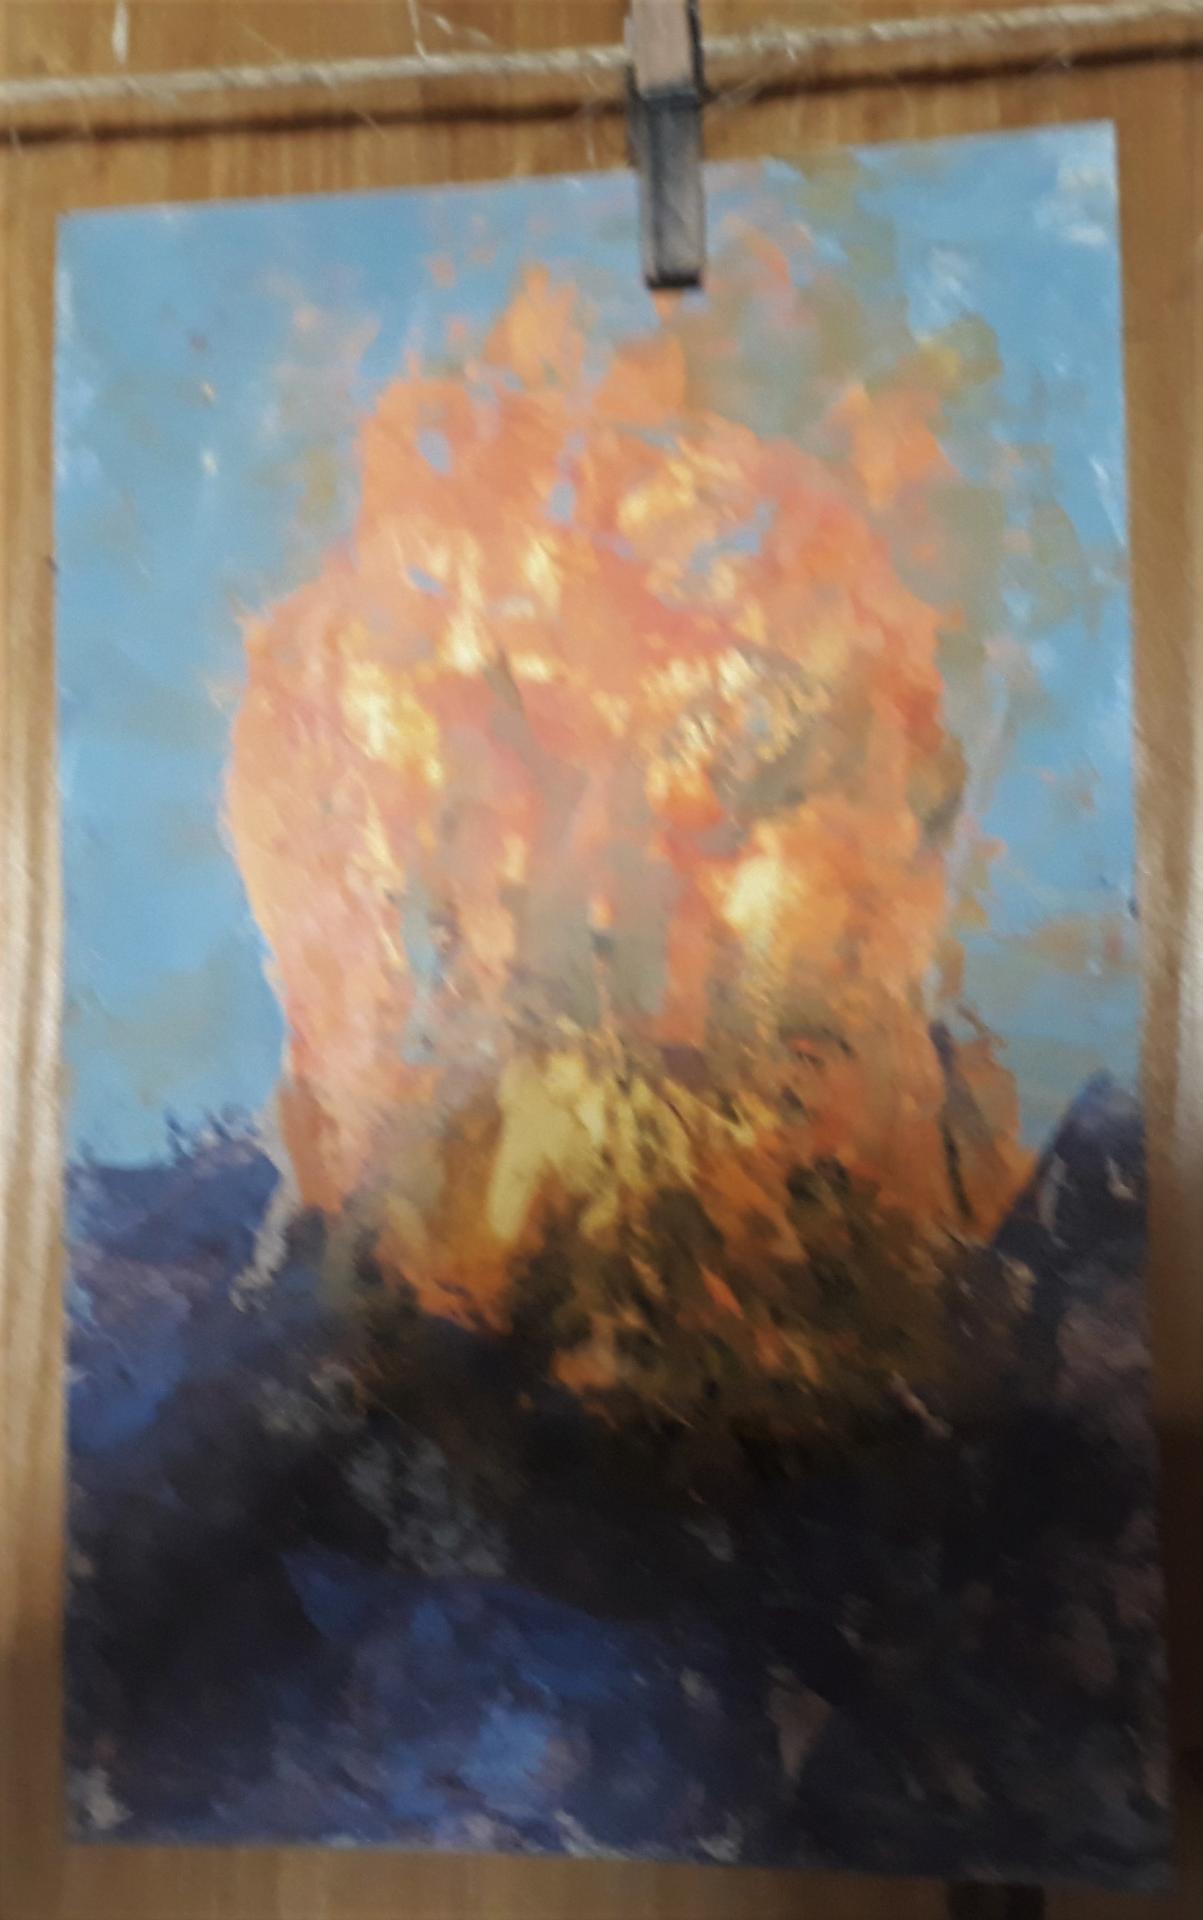 Représenter le feu, avec de la peinture......